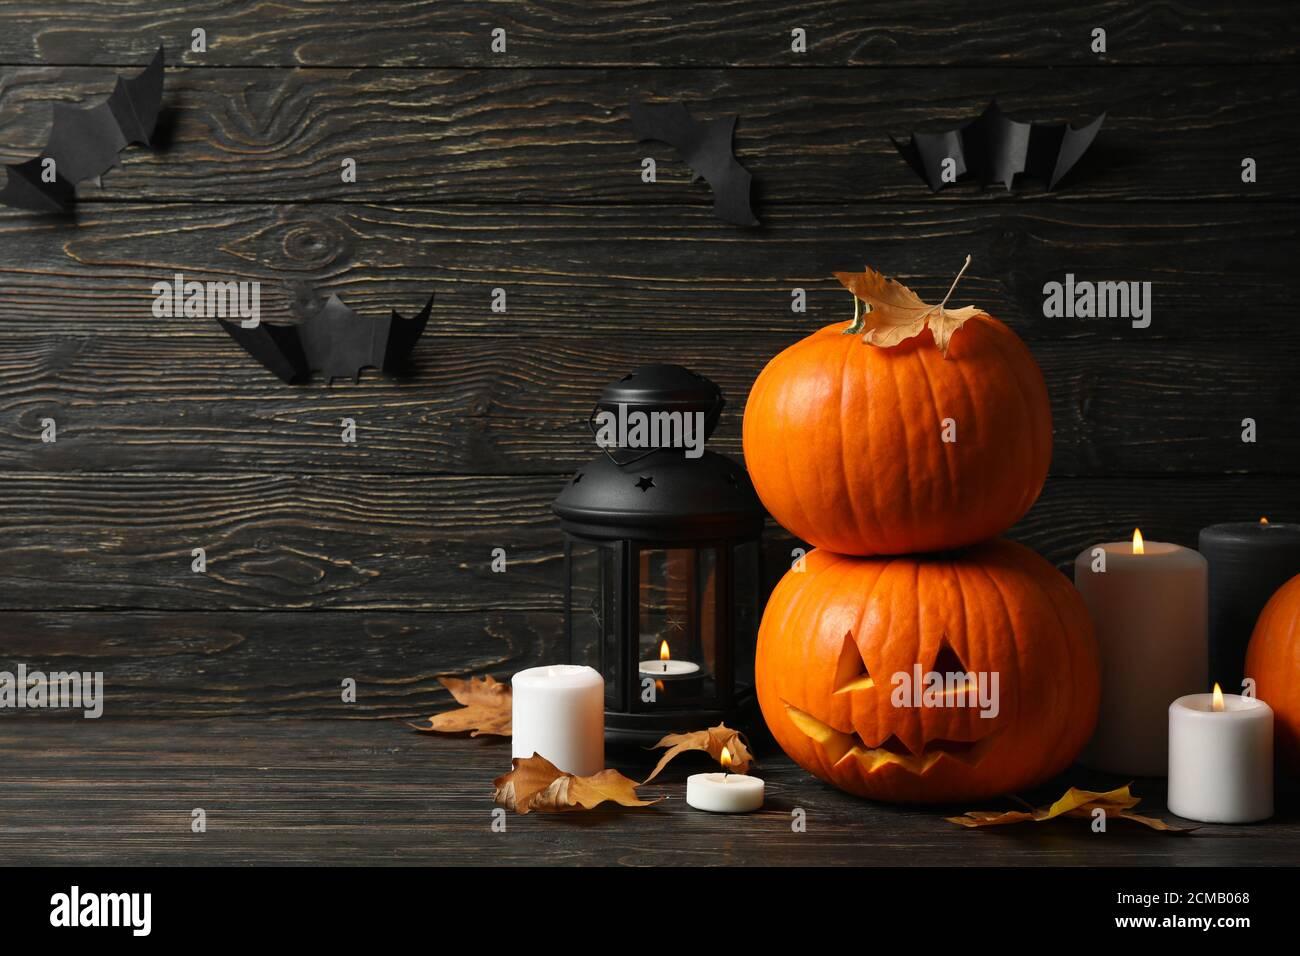 Halloween Pumpkin Accessories.Pumpkins And Halloween Accessories On Wooden Background Stock Photo Alamy